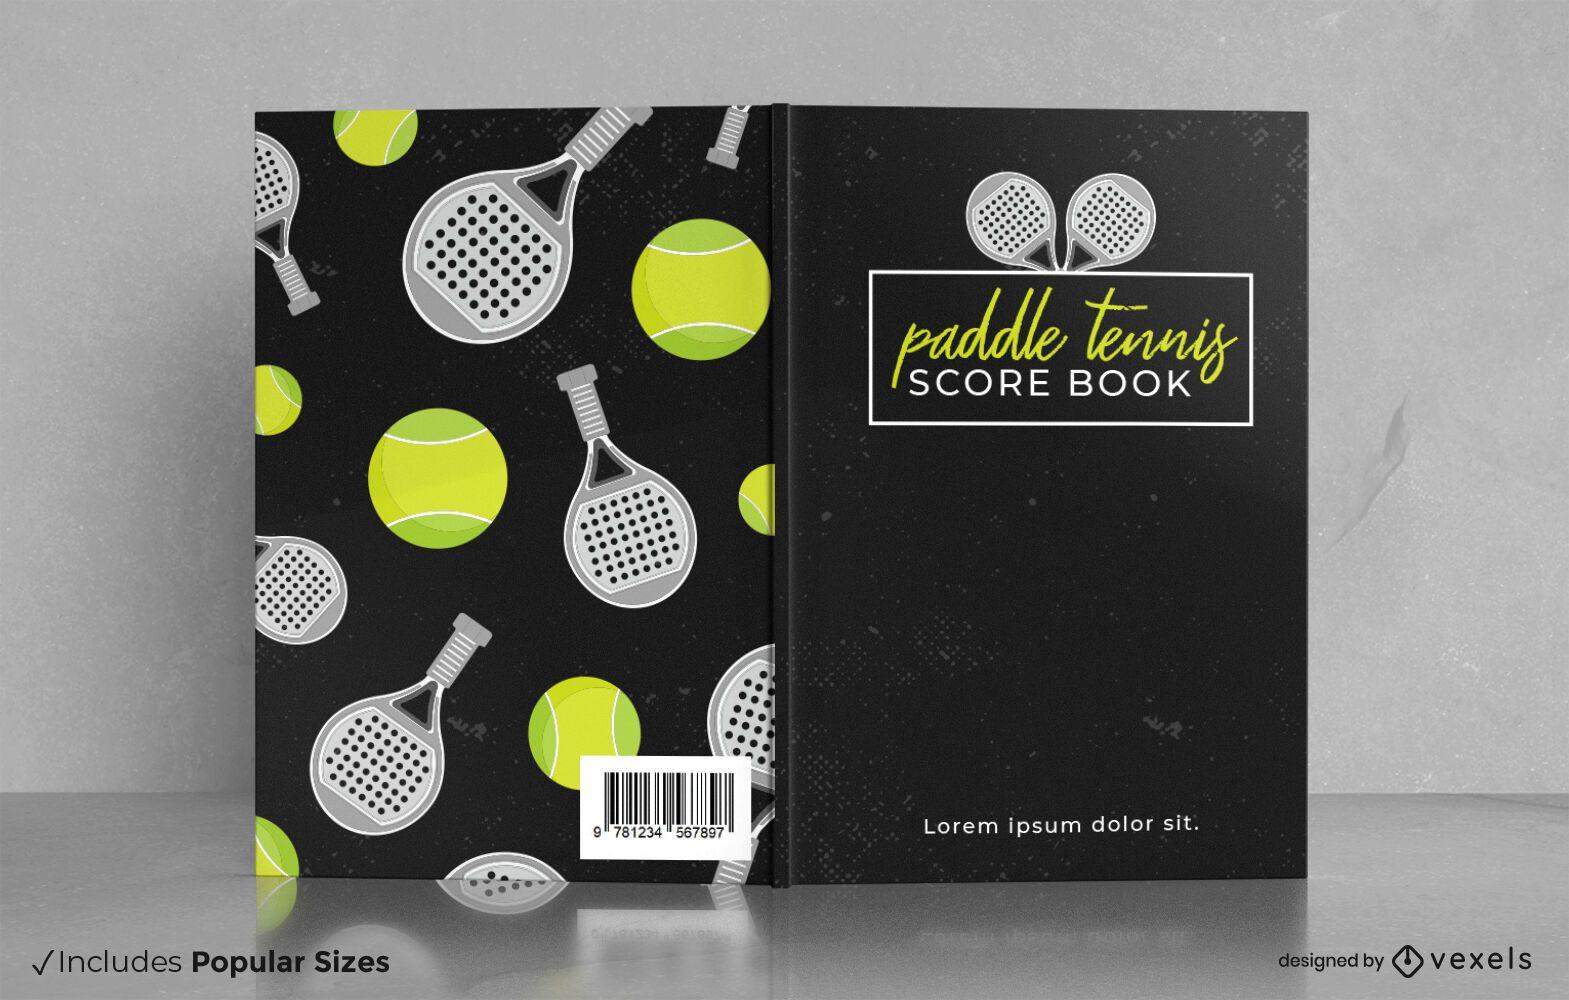 Paddle-Tennis-Score-Buch-Cover-Design